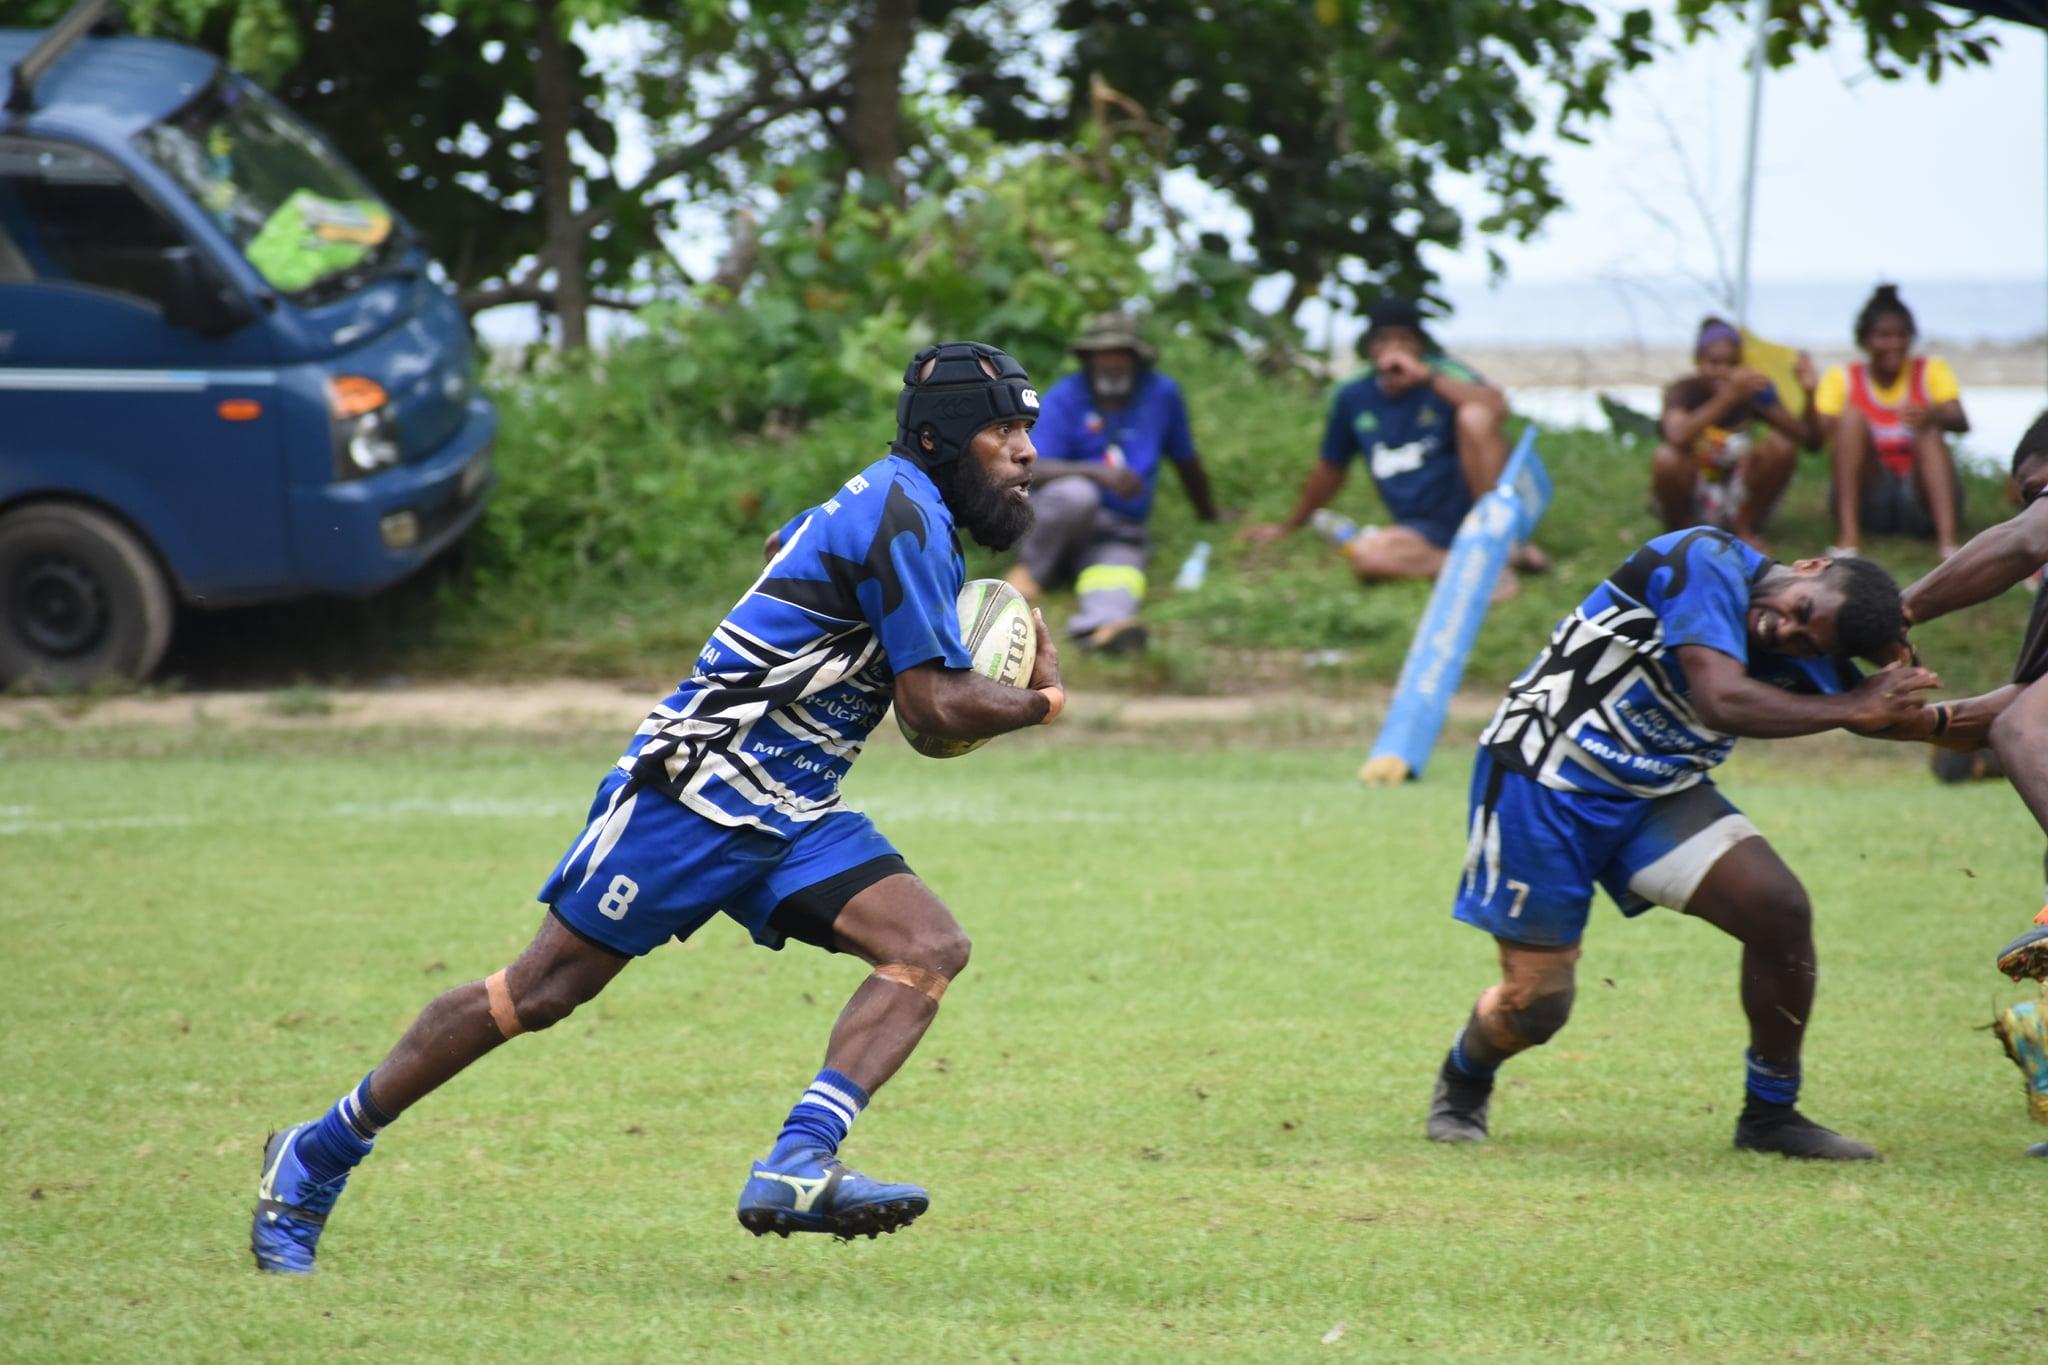 Vanuatu Police Forces move into top two in Port Vila Men's & Women's Championships